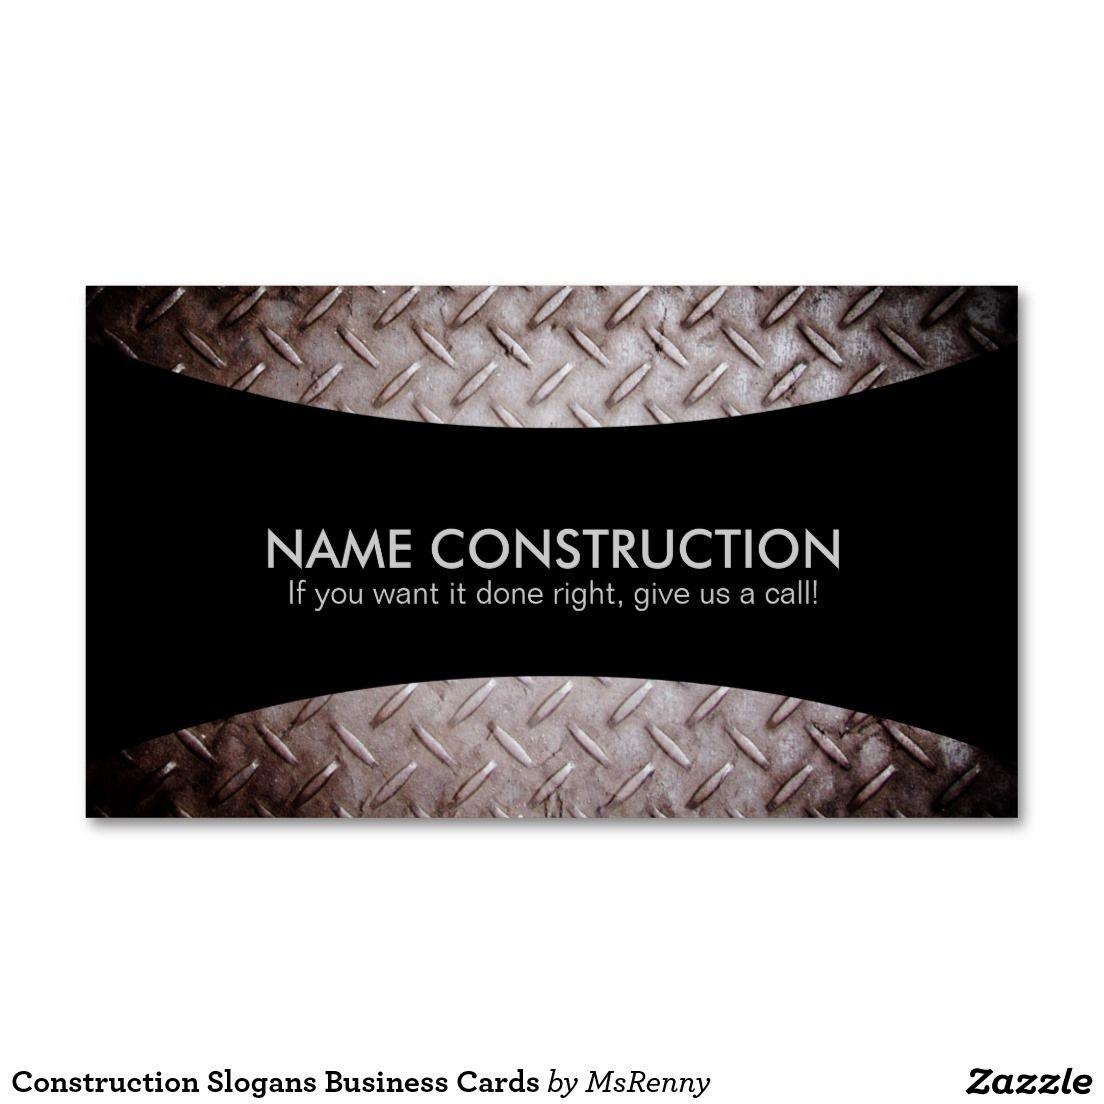 Construction Slogans Business Cards   Pinterest   Slogan ...